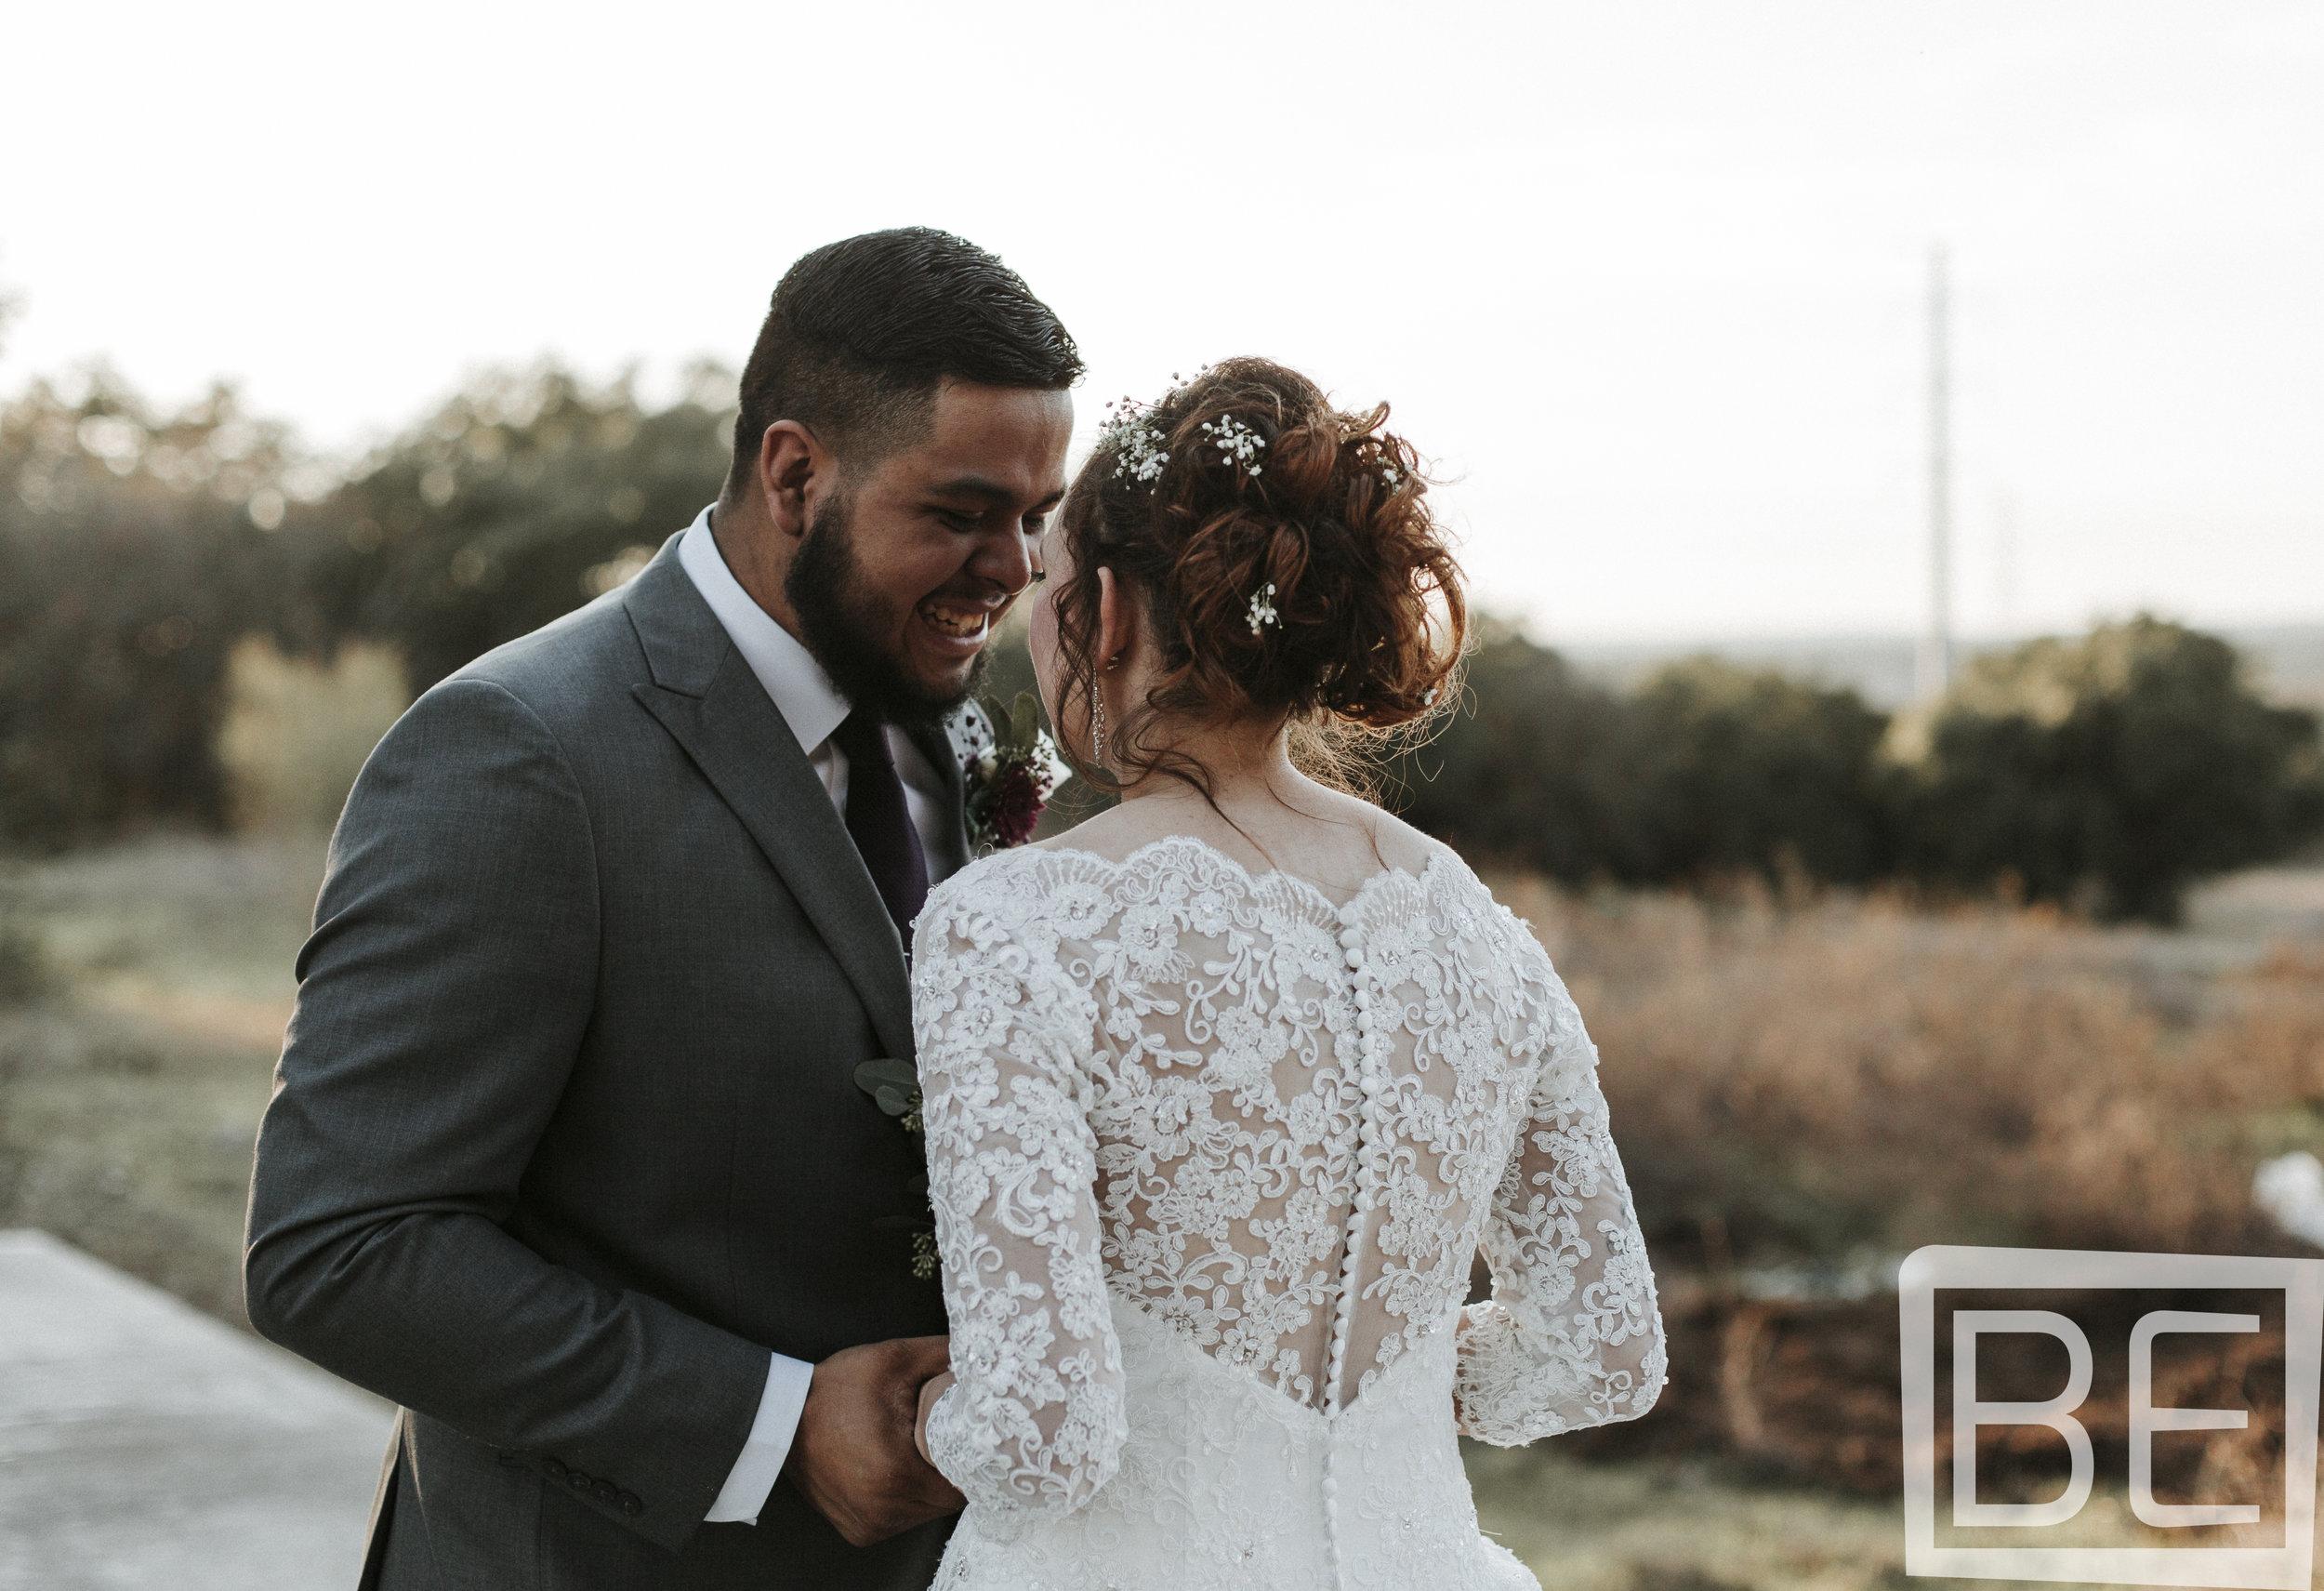 San Antonio Wedding - Soriano Wedding - Tanner Beason Photography-15.jpg